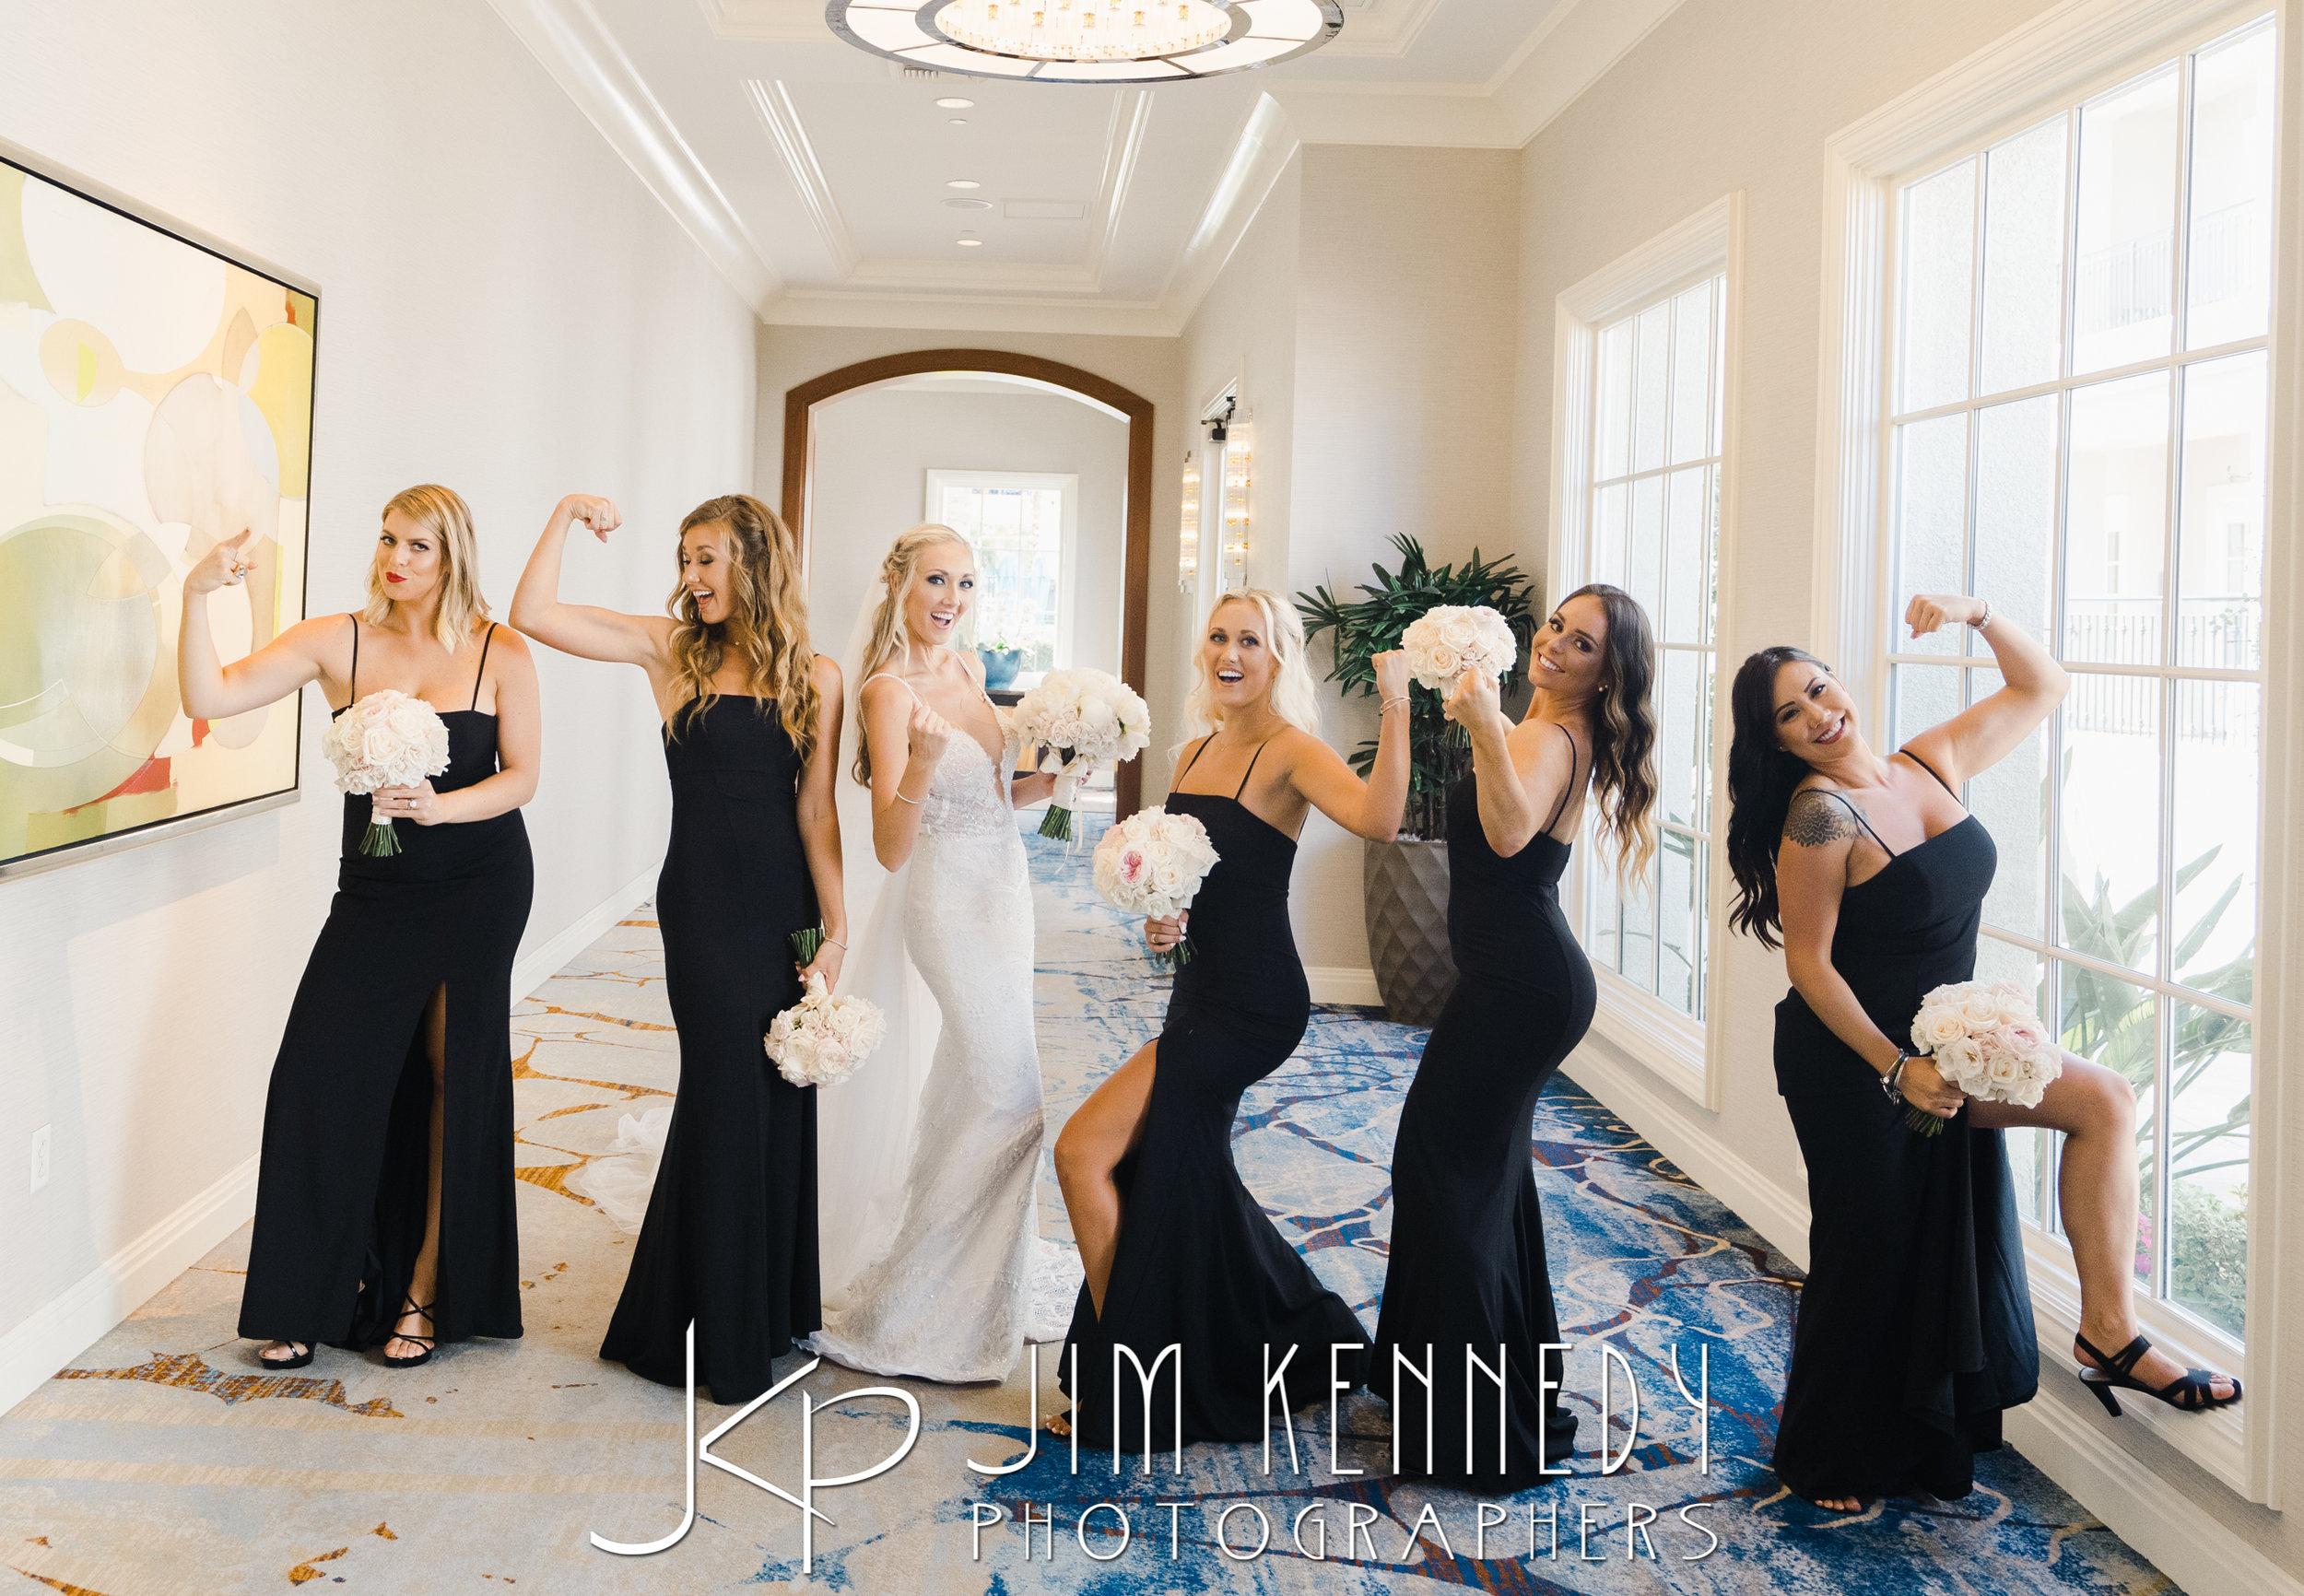 balboa-bay-resort-wedding-brooke-kevin_0063.JPG